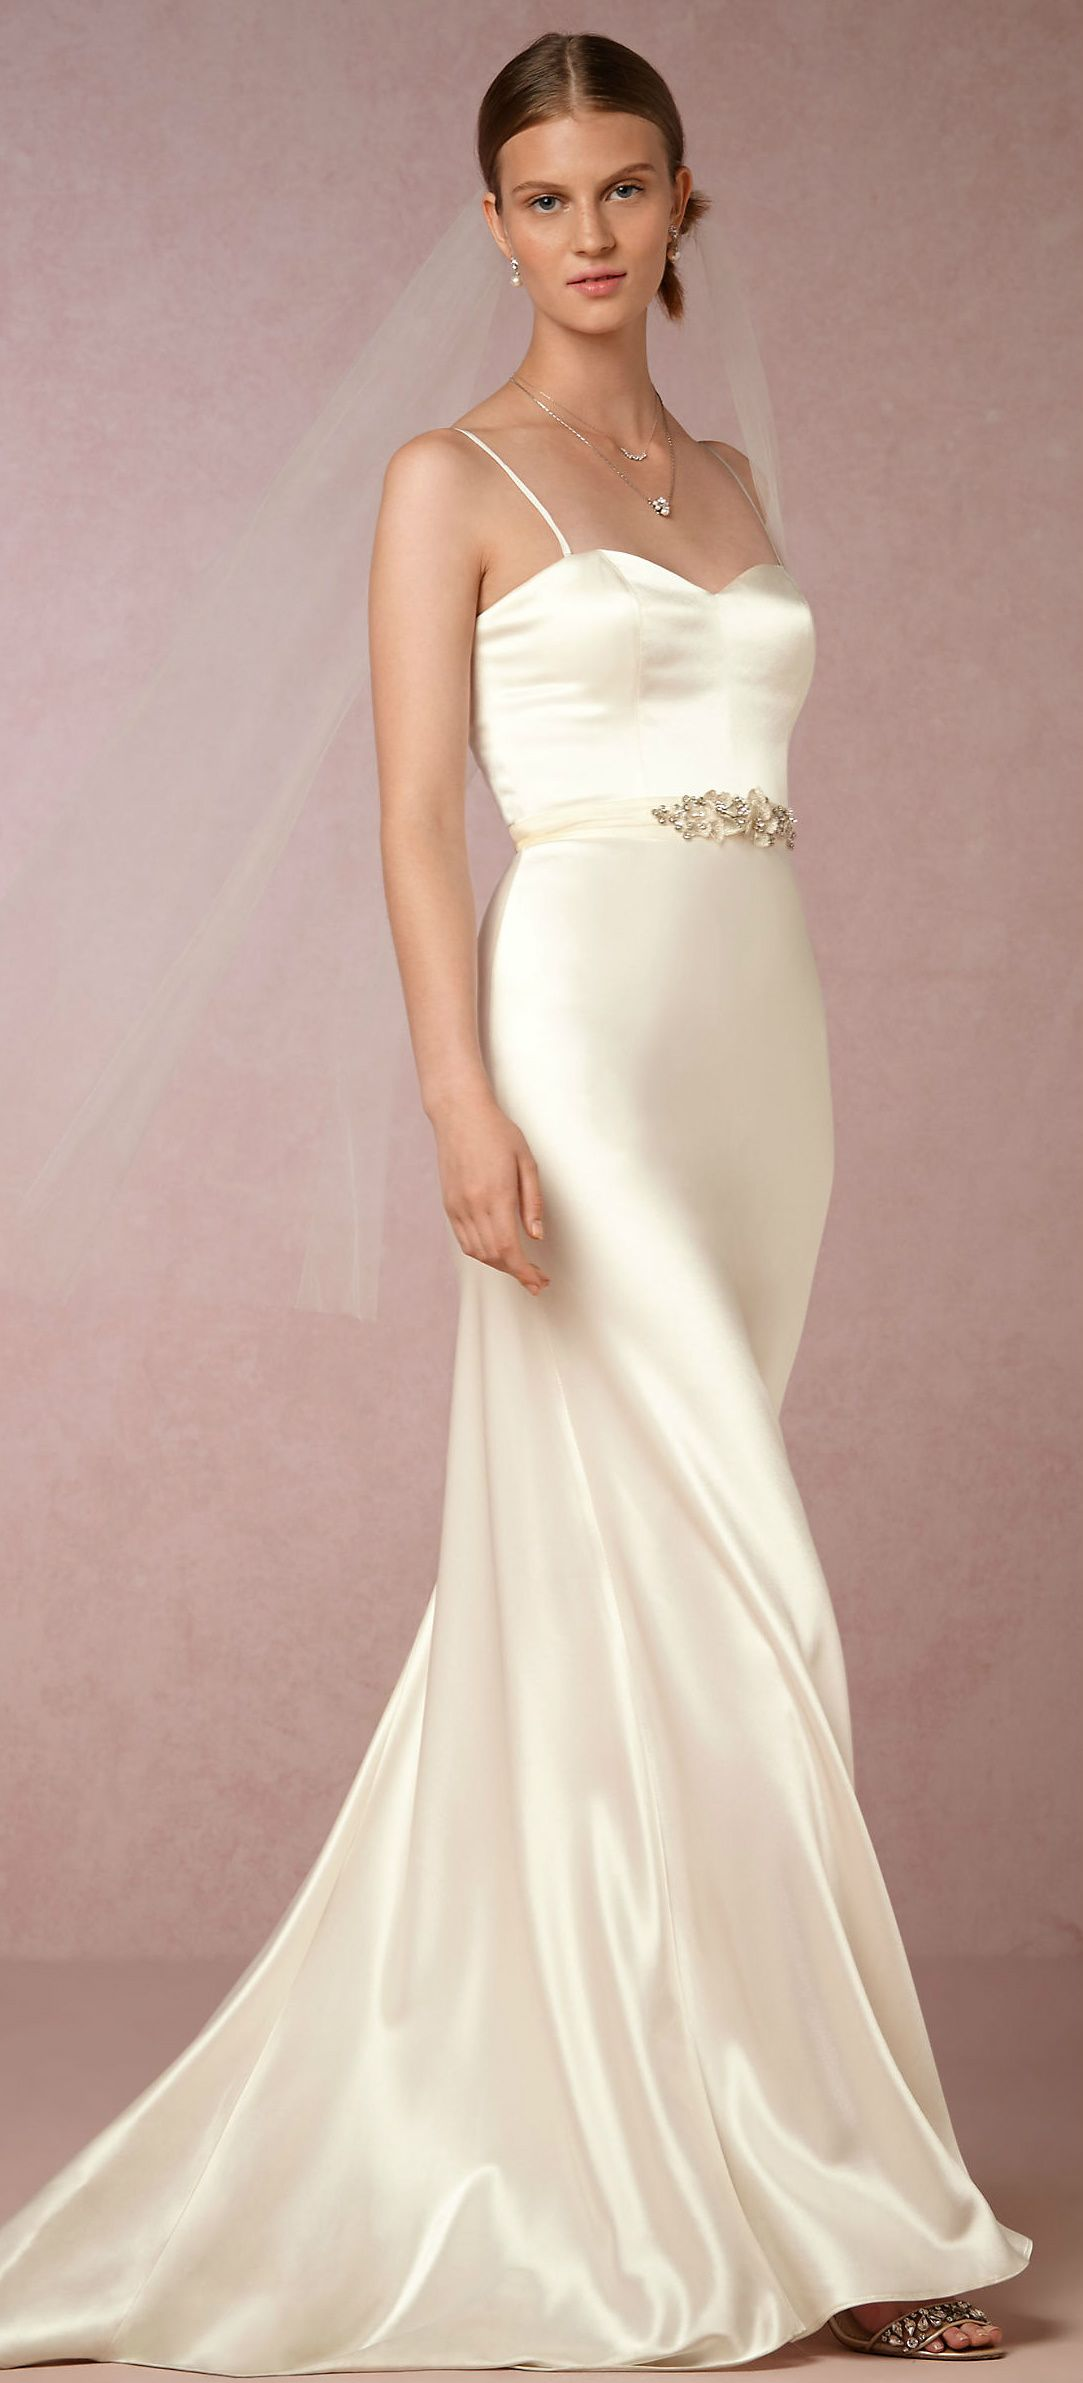 New wedding dresses for 2017   Sleek wedding dress from Catherine ...